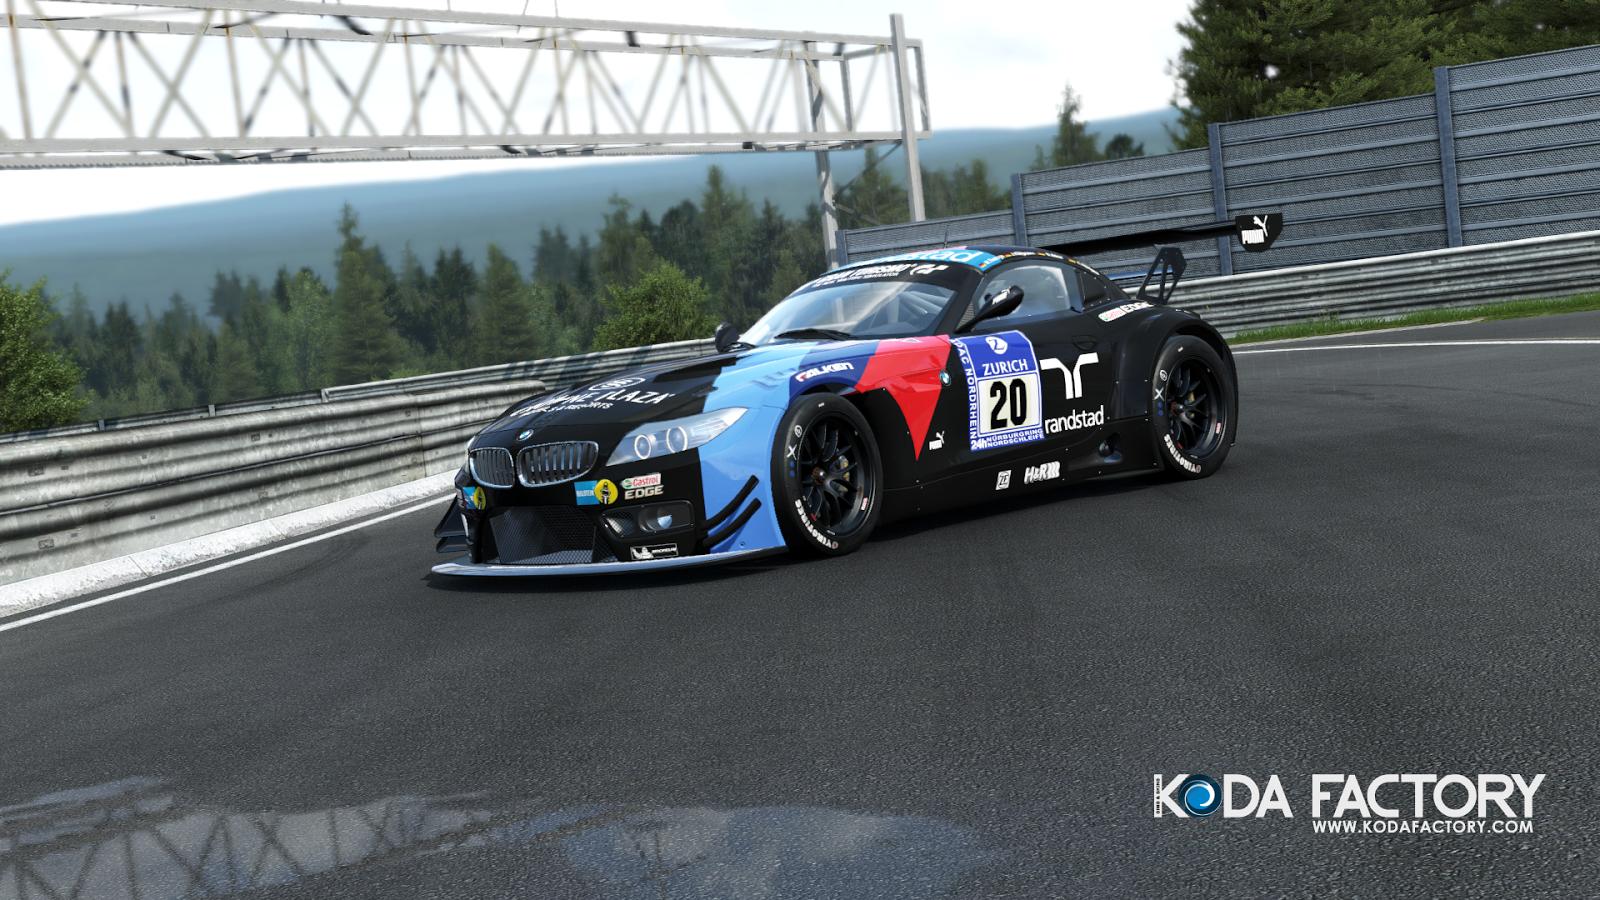 Koda Factory Schubert Motorsport 20 Bmw Z4 Gt3 Pc A R S